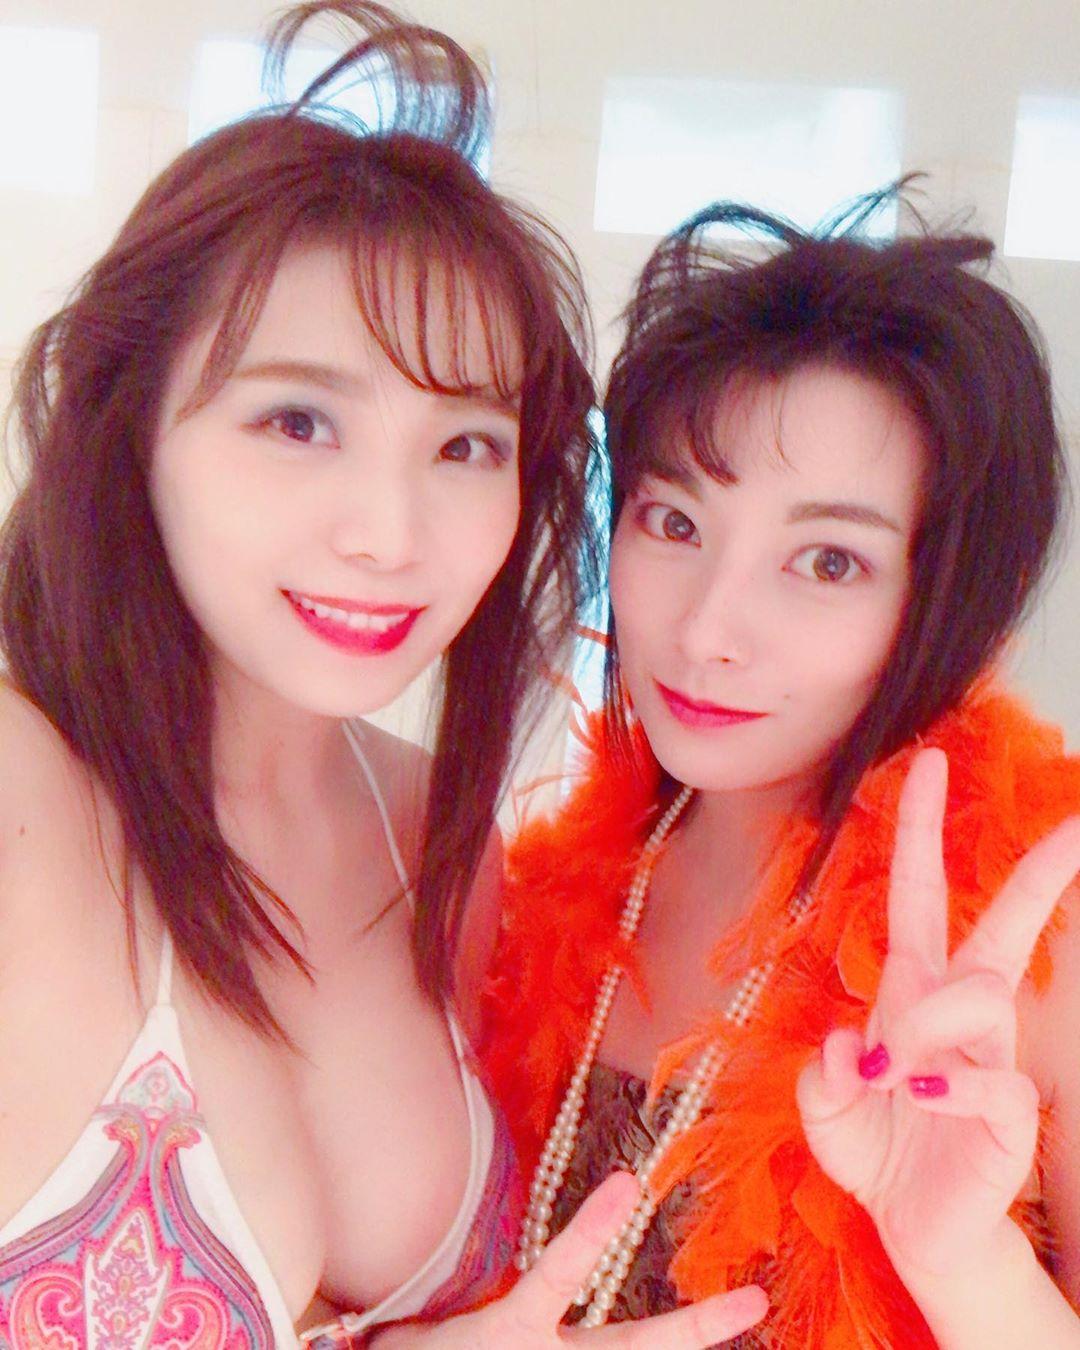 mitsui_risa115.jpg